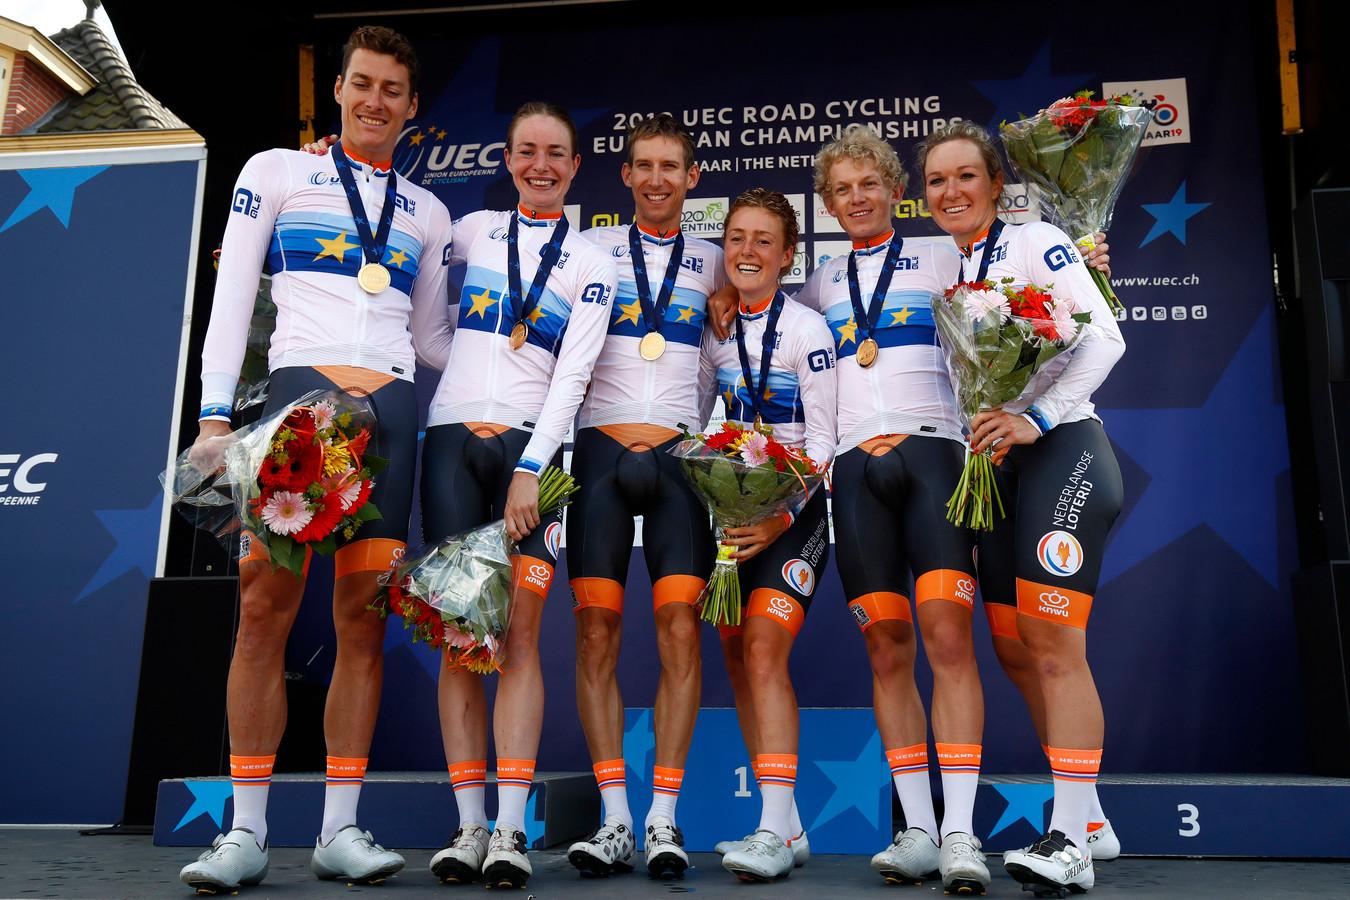 De winnaars van Nederland, met v.l.n.r.: Ramon Sinkeldam, Riejanne Markus, Bauke Mollema, Floortje Mackaij, Koen Bouwman en Amy Pieters.